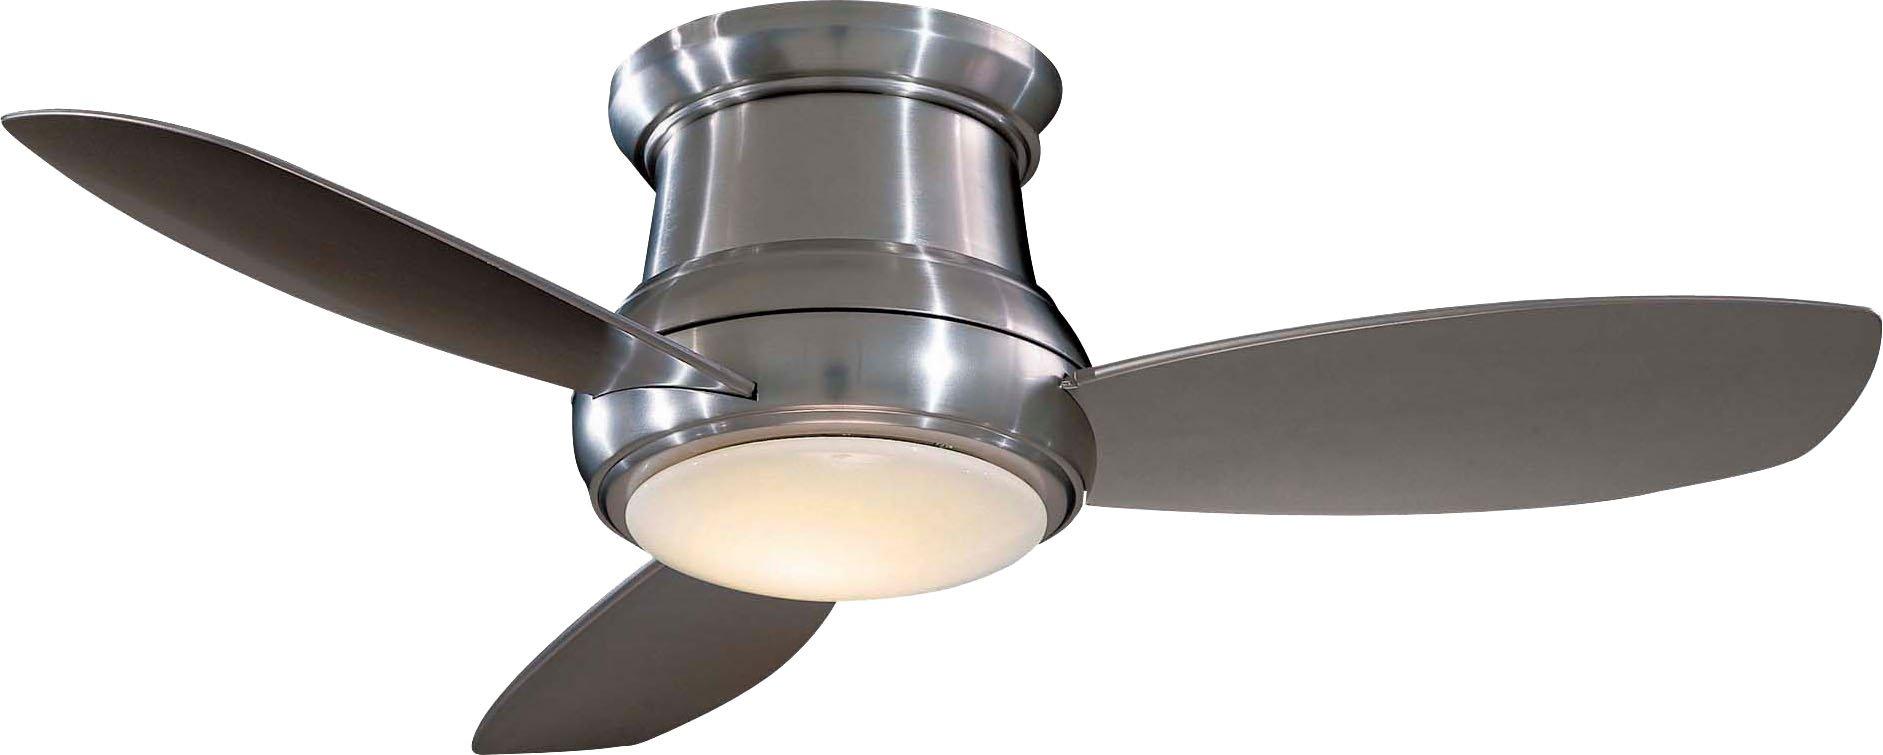 Minka-Aire F519-BN, Concept II, 52'' Ceiling Fan, Brushed Nickel